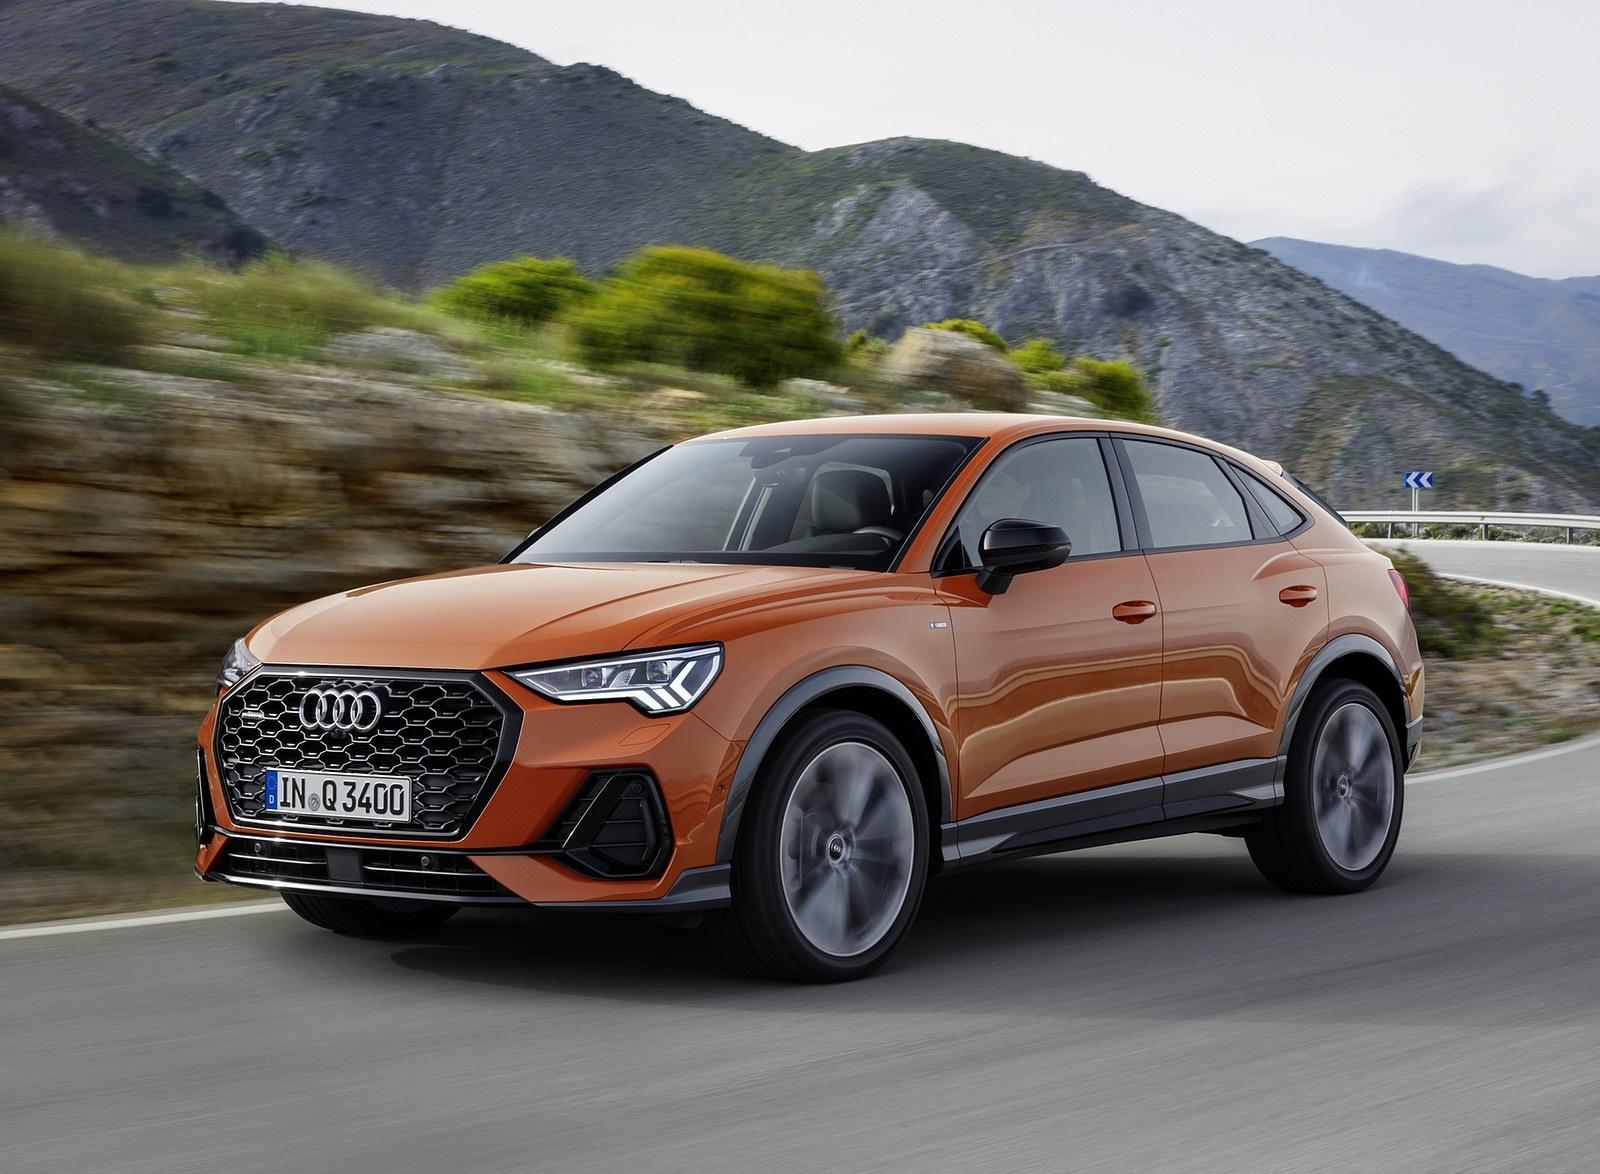 2020 Audi Q3 Sportback S line (Color: Pulse Orange) Front Three-Quarter Wallpapers (1)